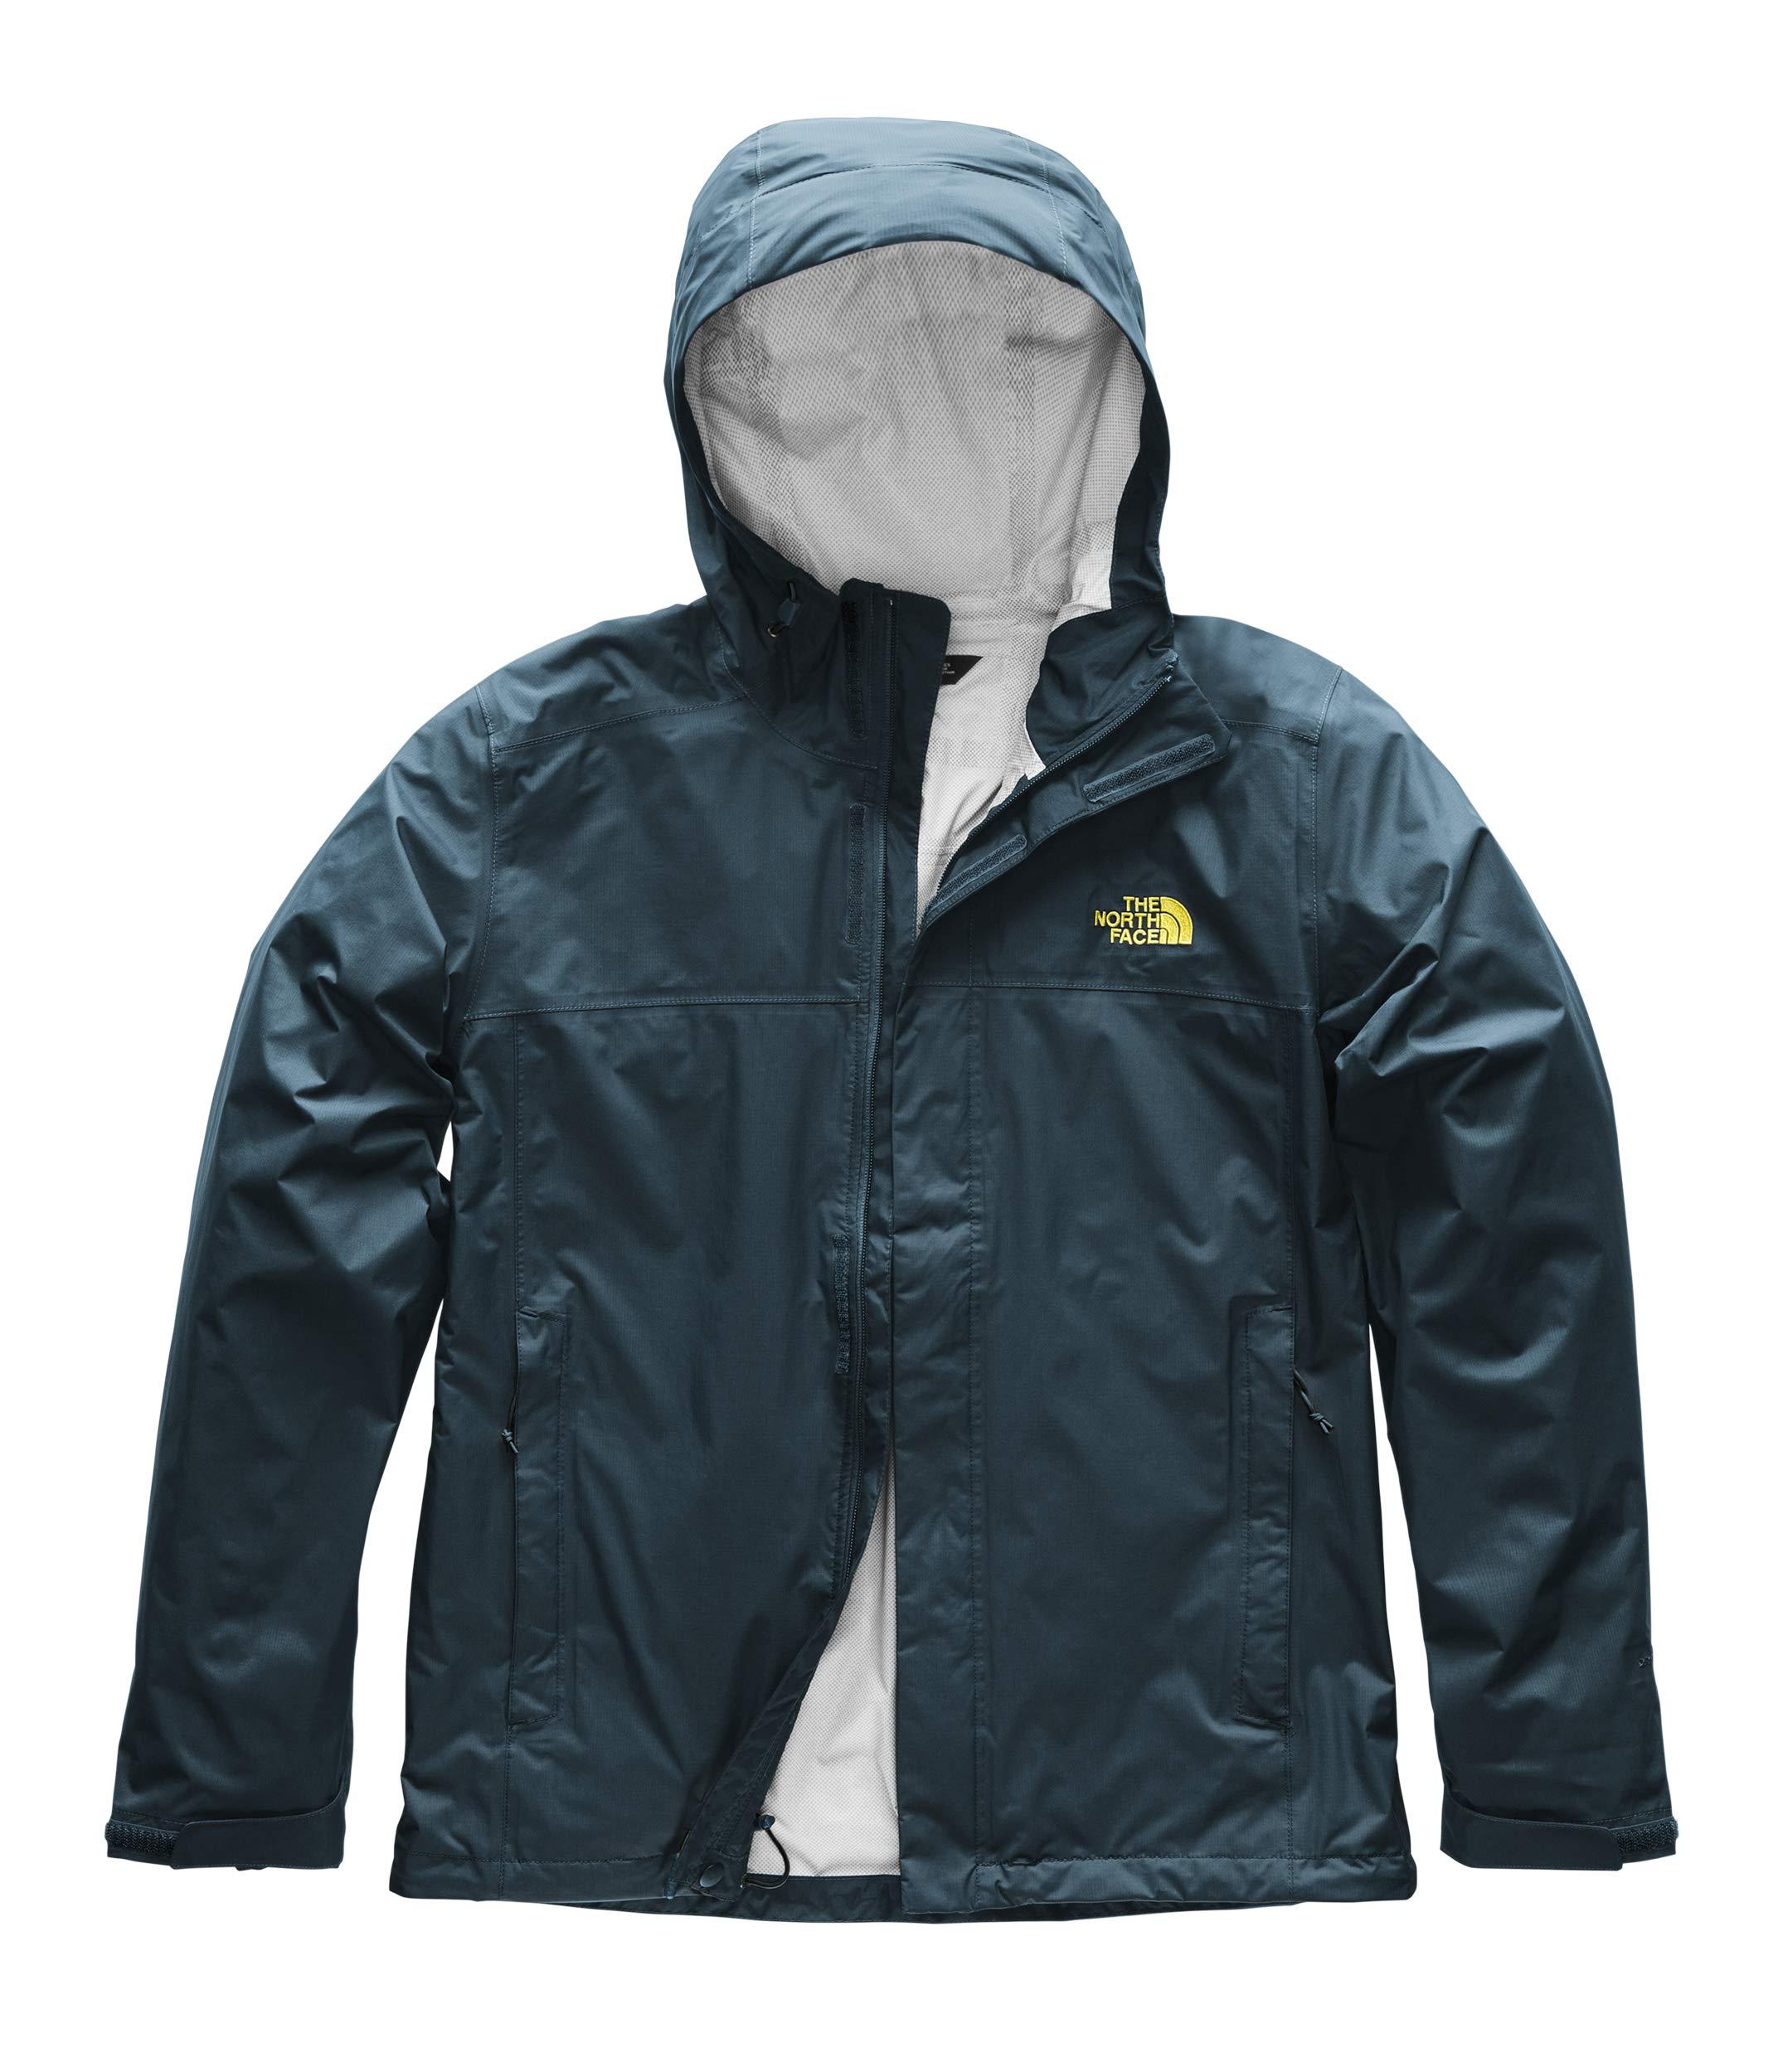 The North Face Men's Venture 2 Jacket Kodiak Blue/Kodiak Blue XX-Large by The North Face